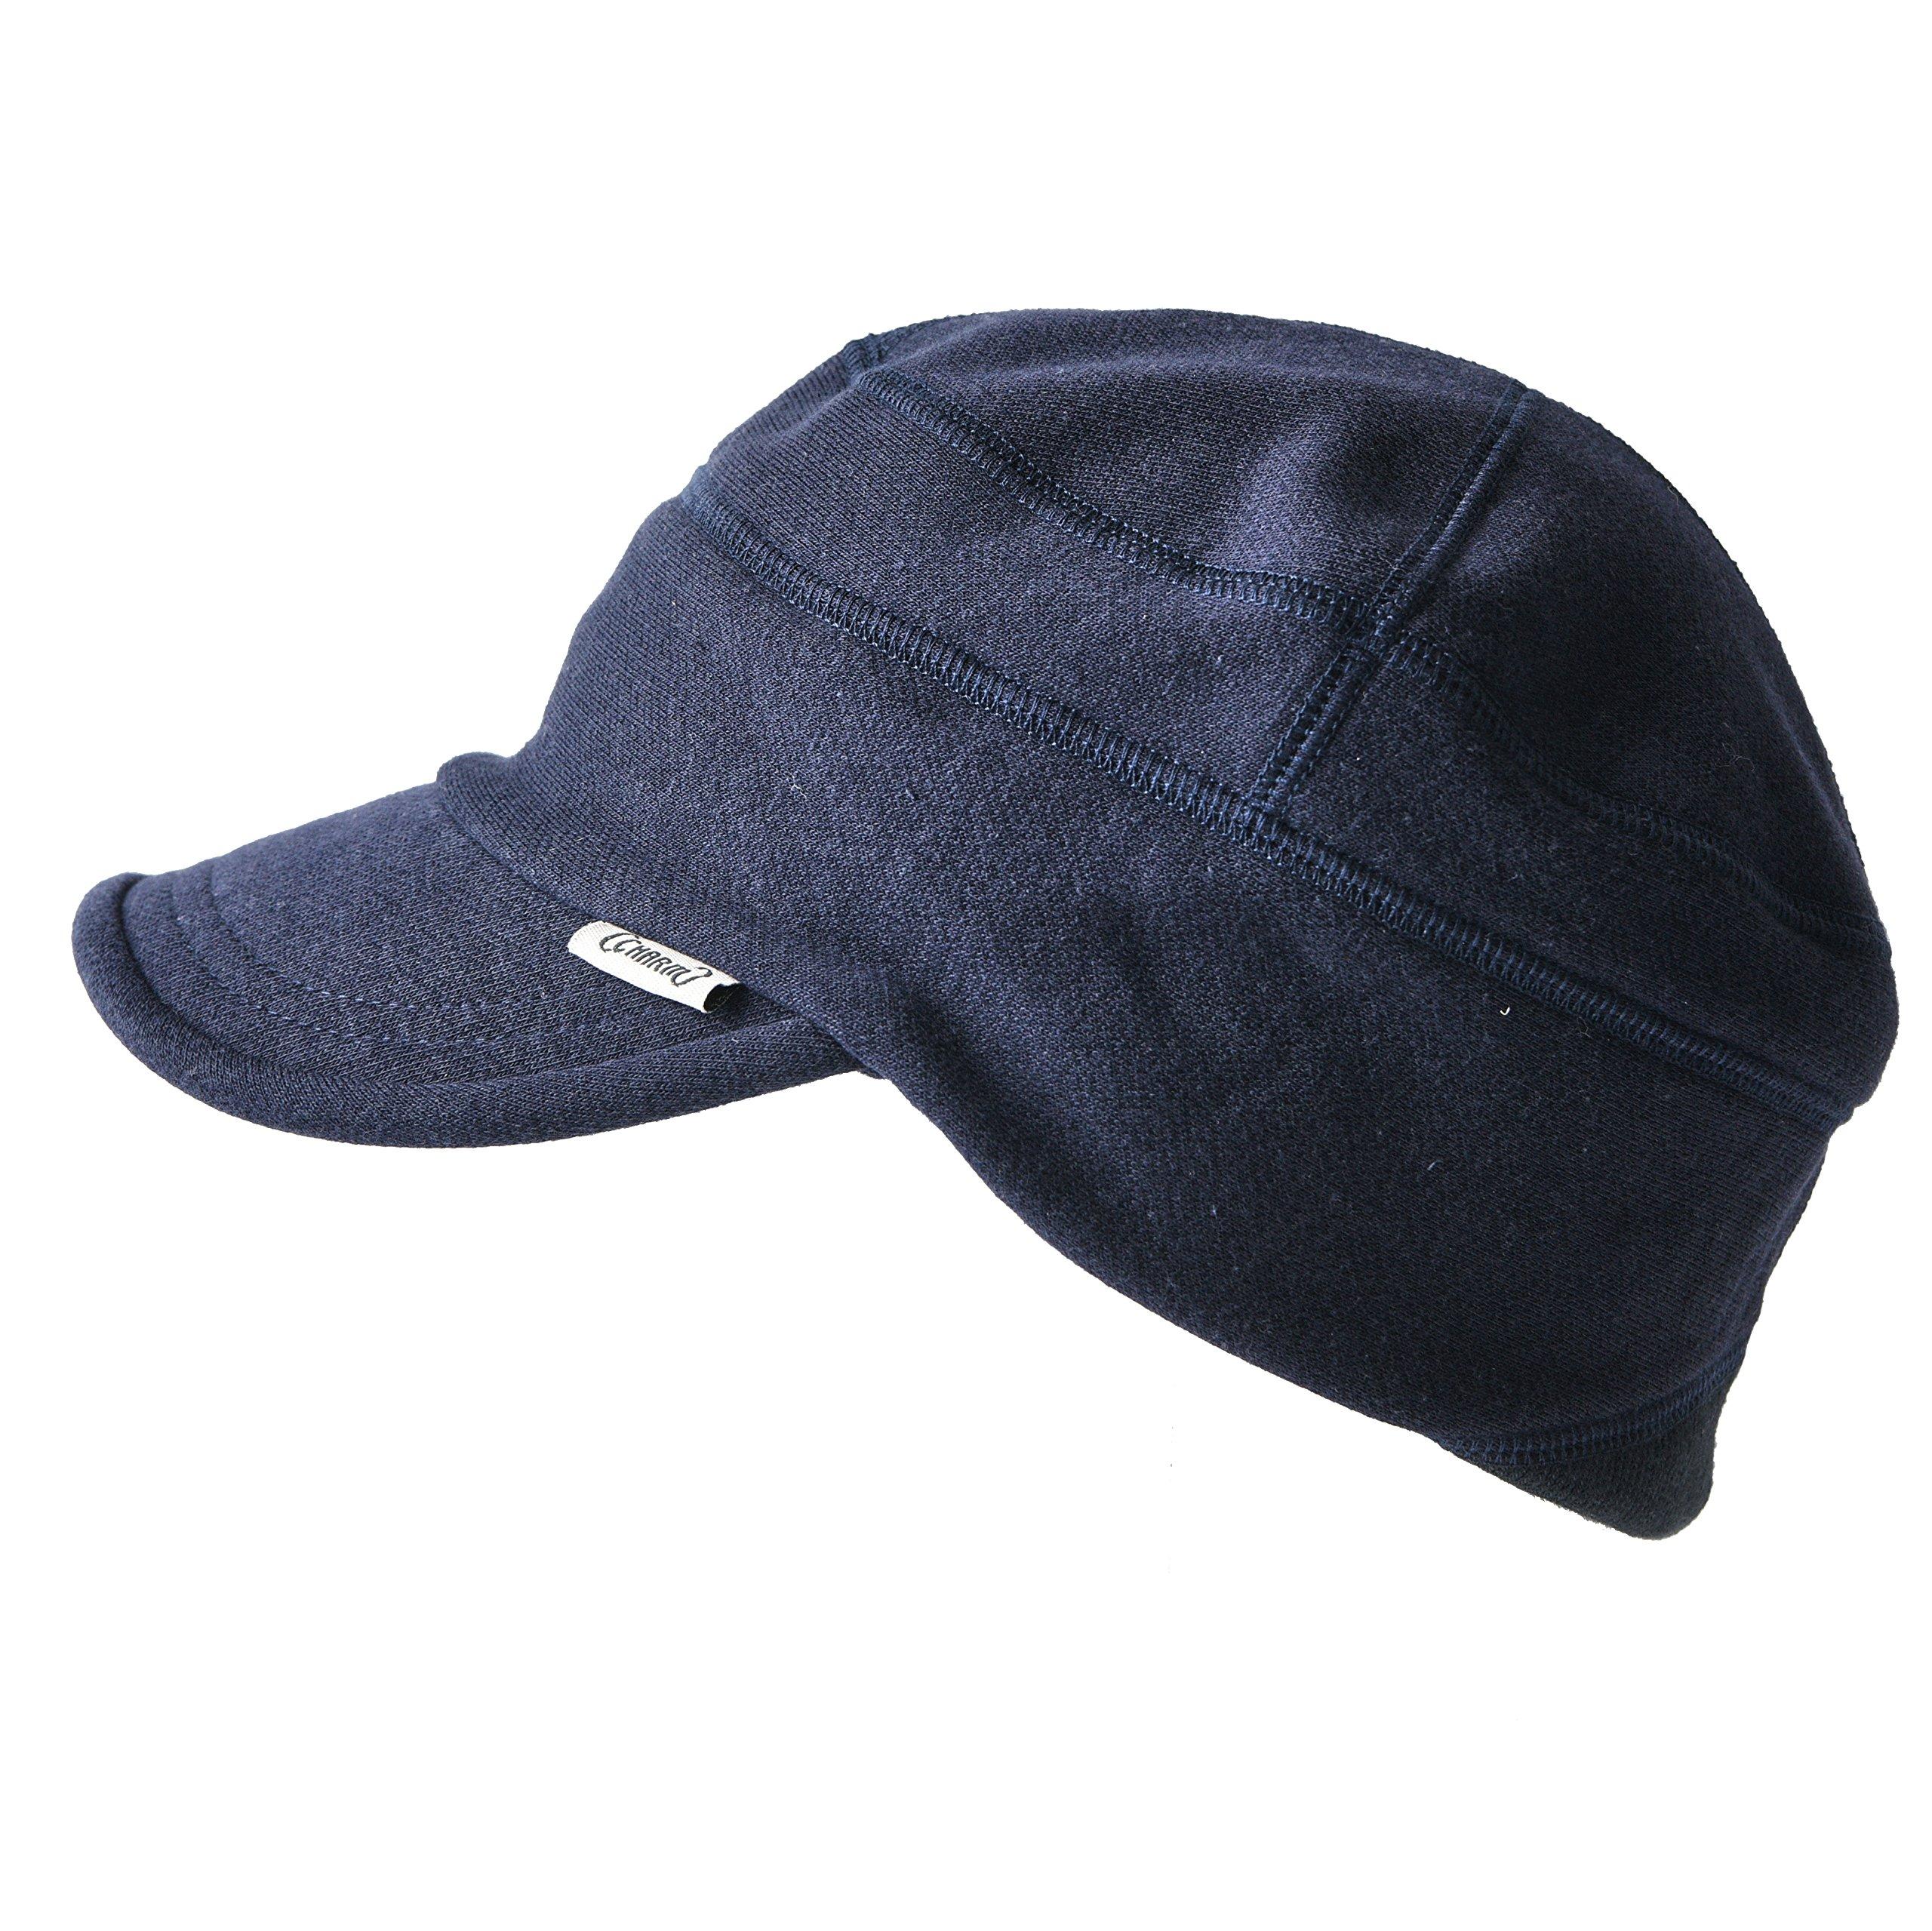 CHARM Mens Cotton Baseball Military Hat - Womens Summer Stretch Peak Cap Winter